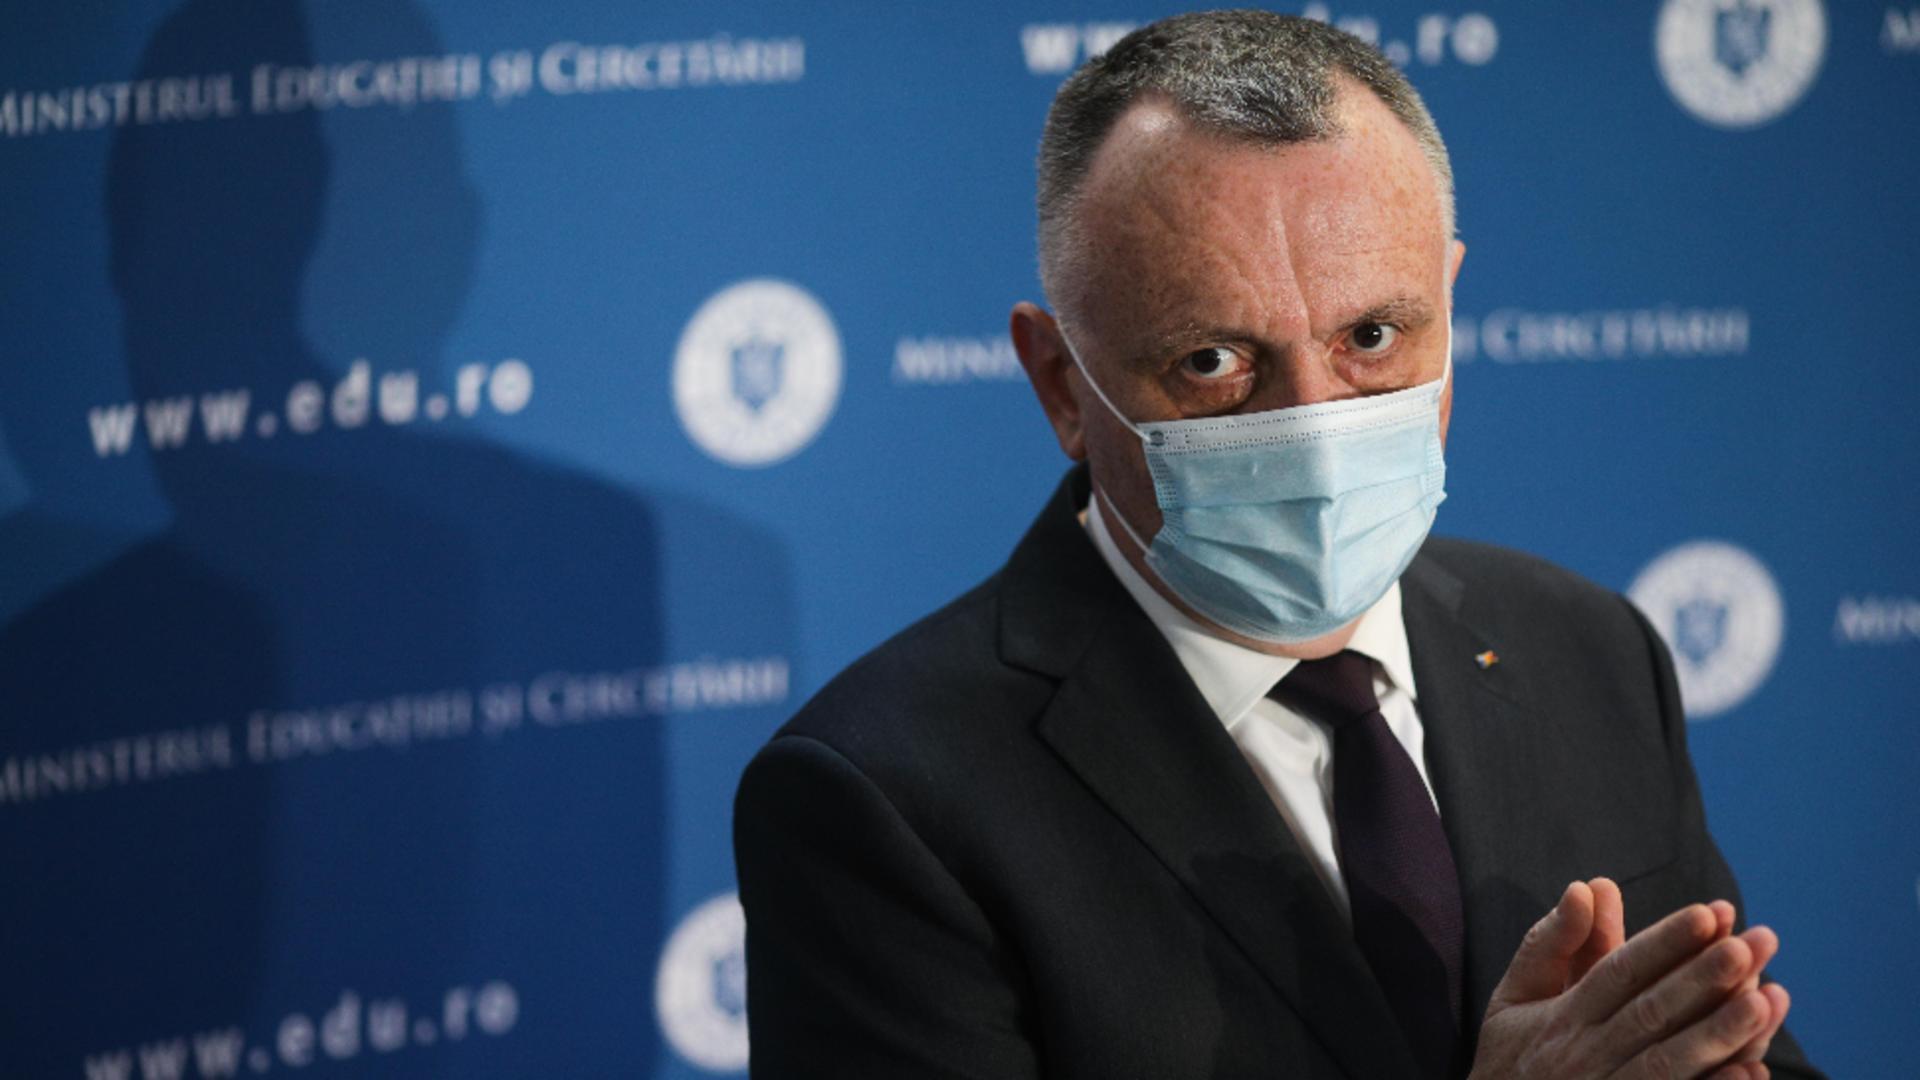 Sorin Cîmpeanu, ministrul Educației / Foto: Inquam / Octav Ganea